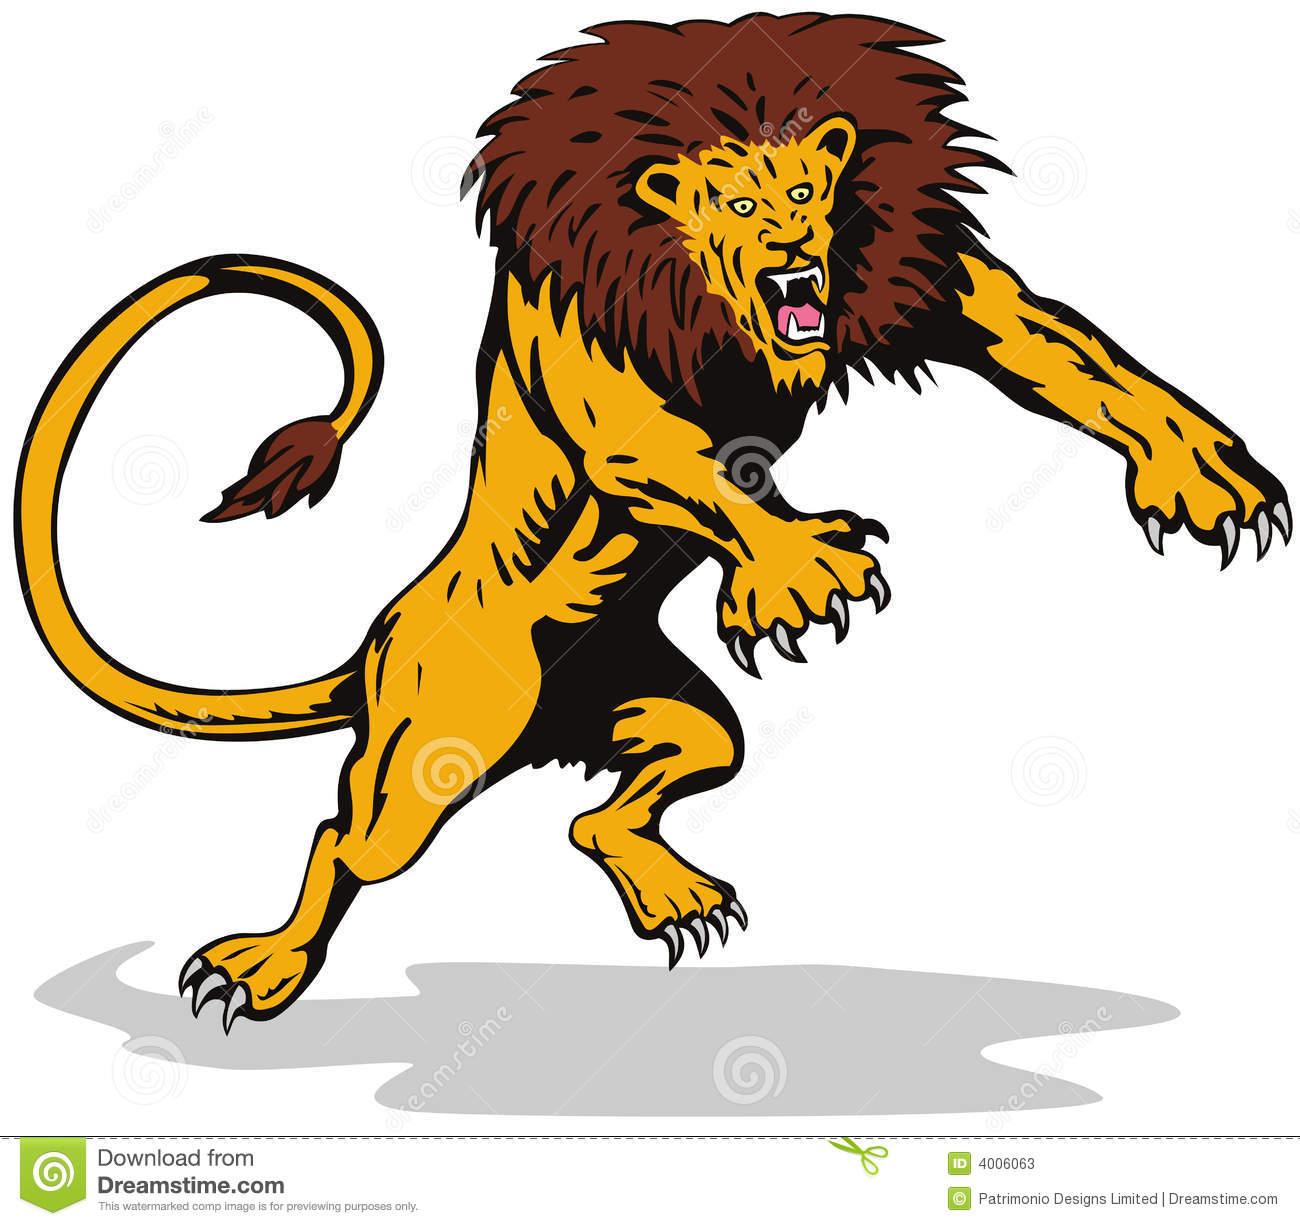 Lion attack clipart.